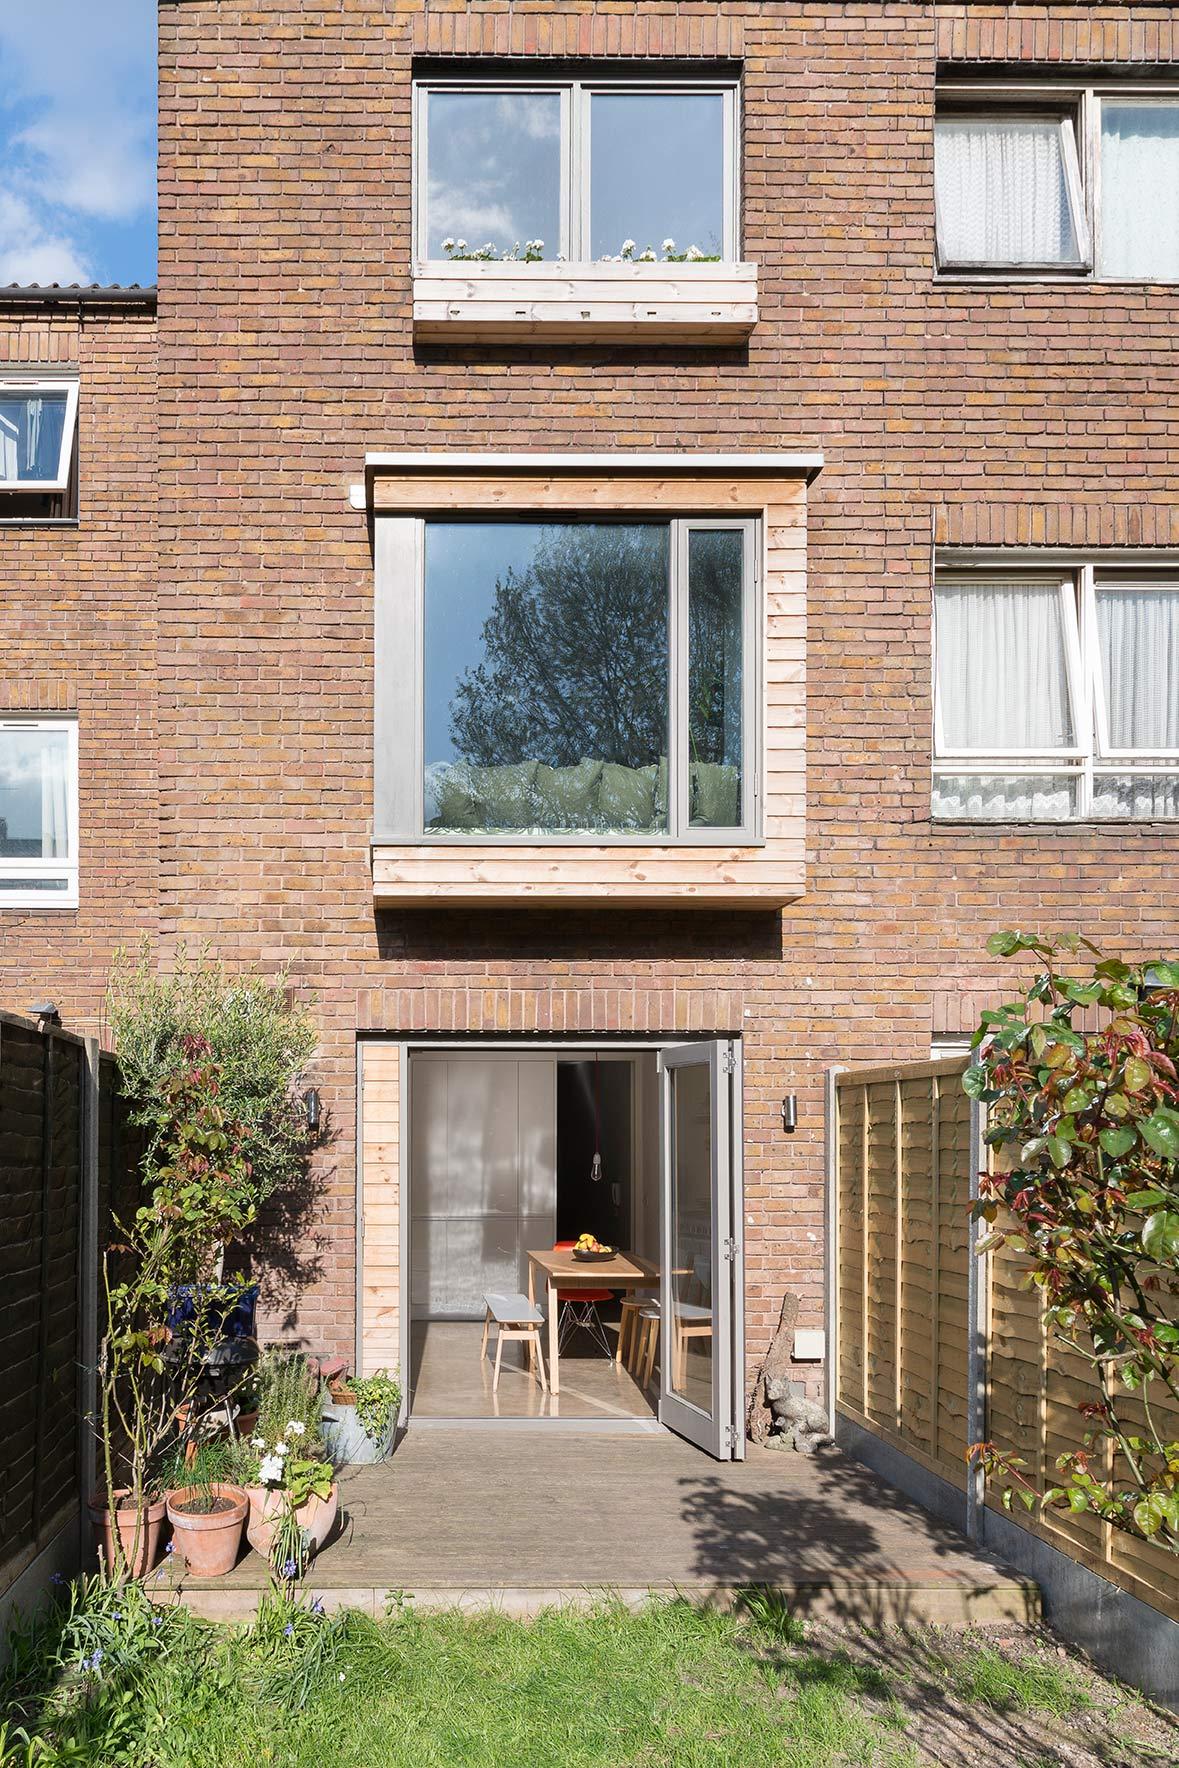 Brick_Lane05.jpg